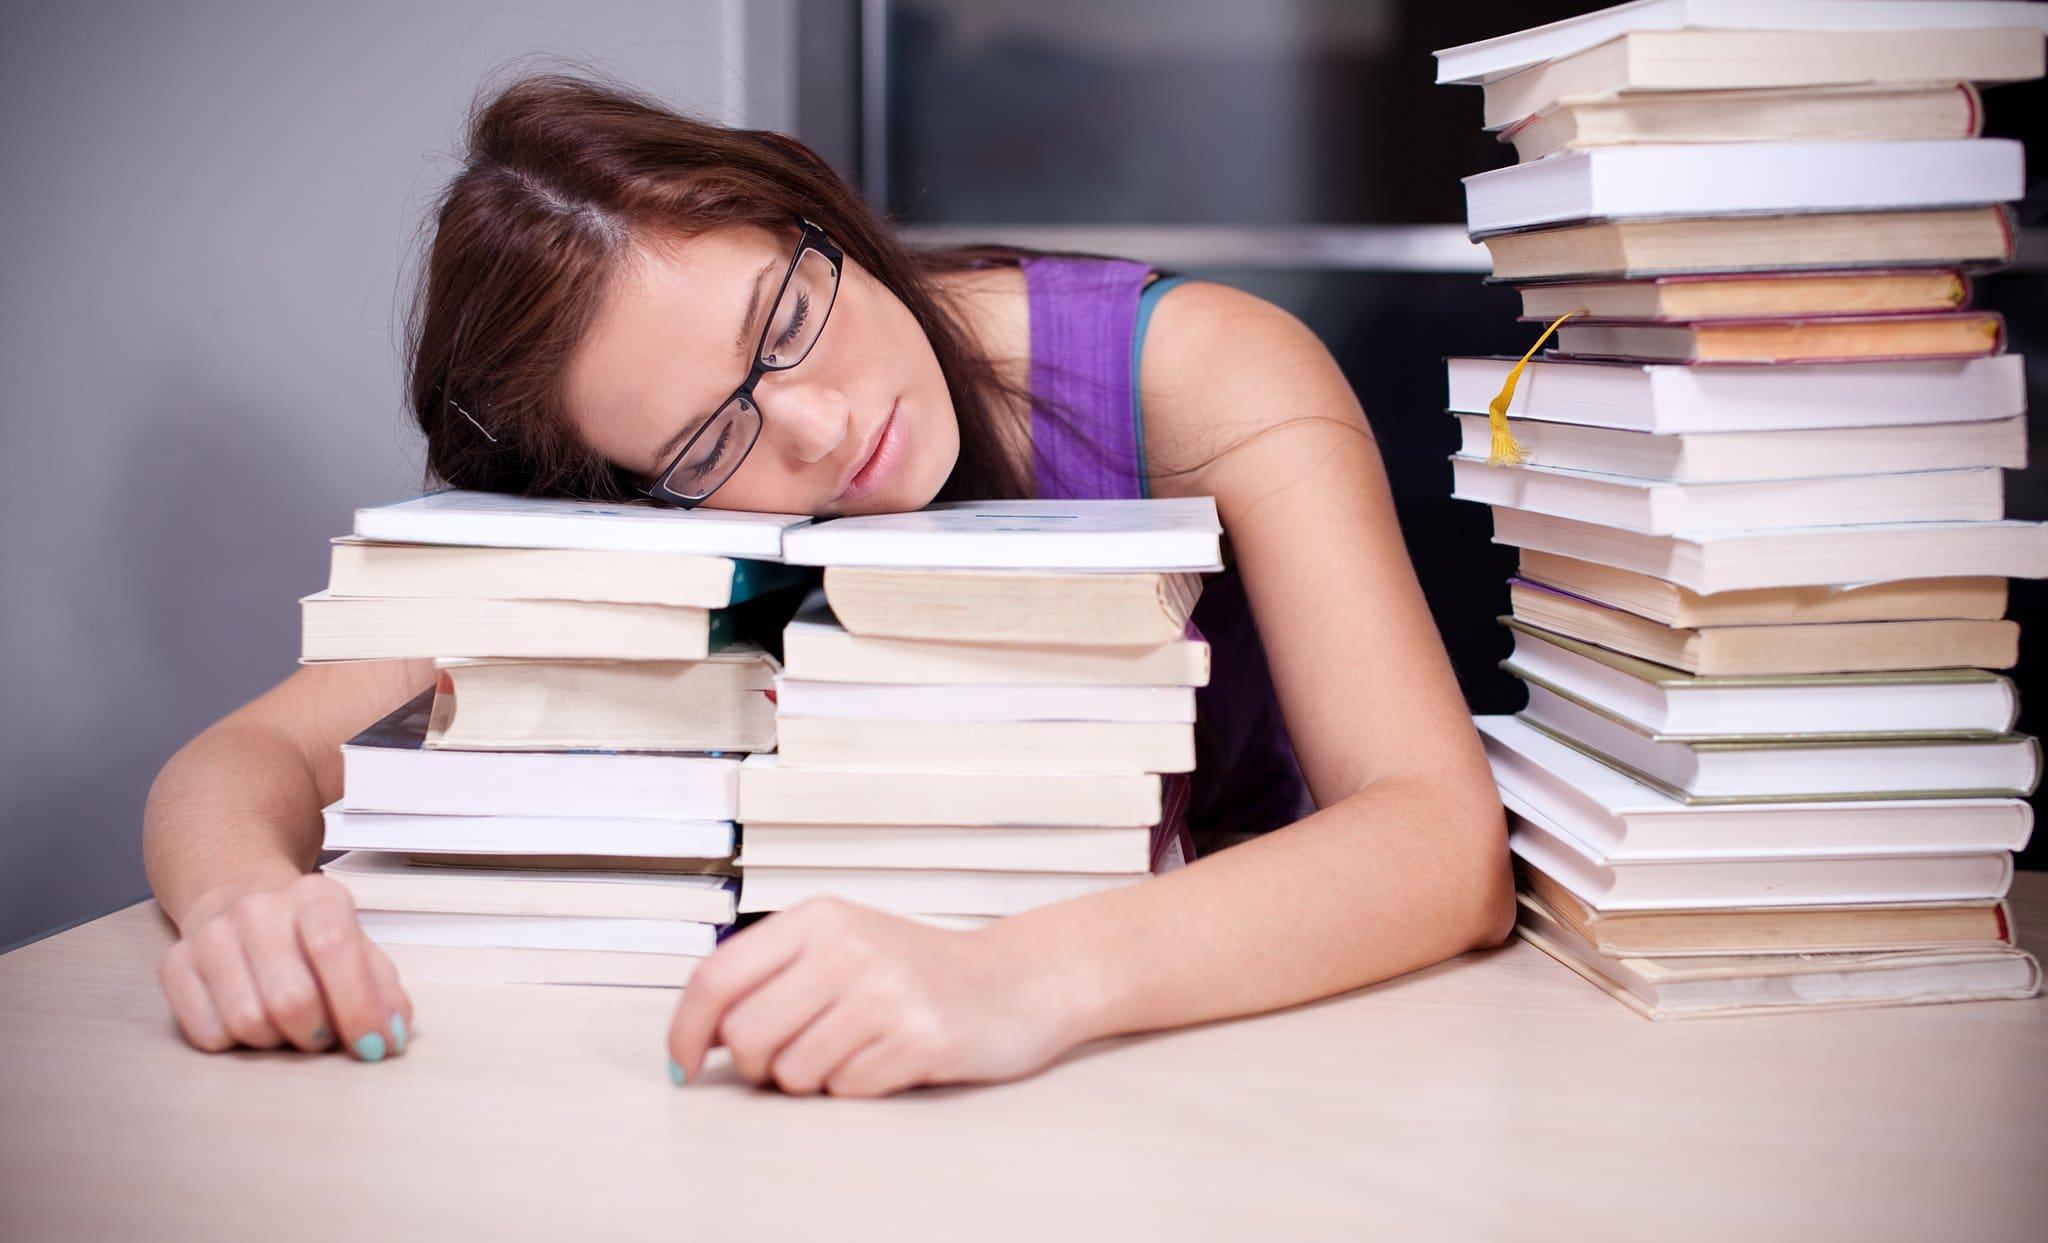 Может ли мозг учиться во сне